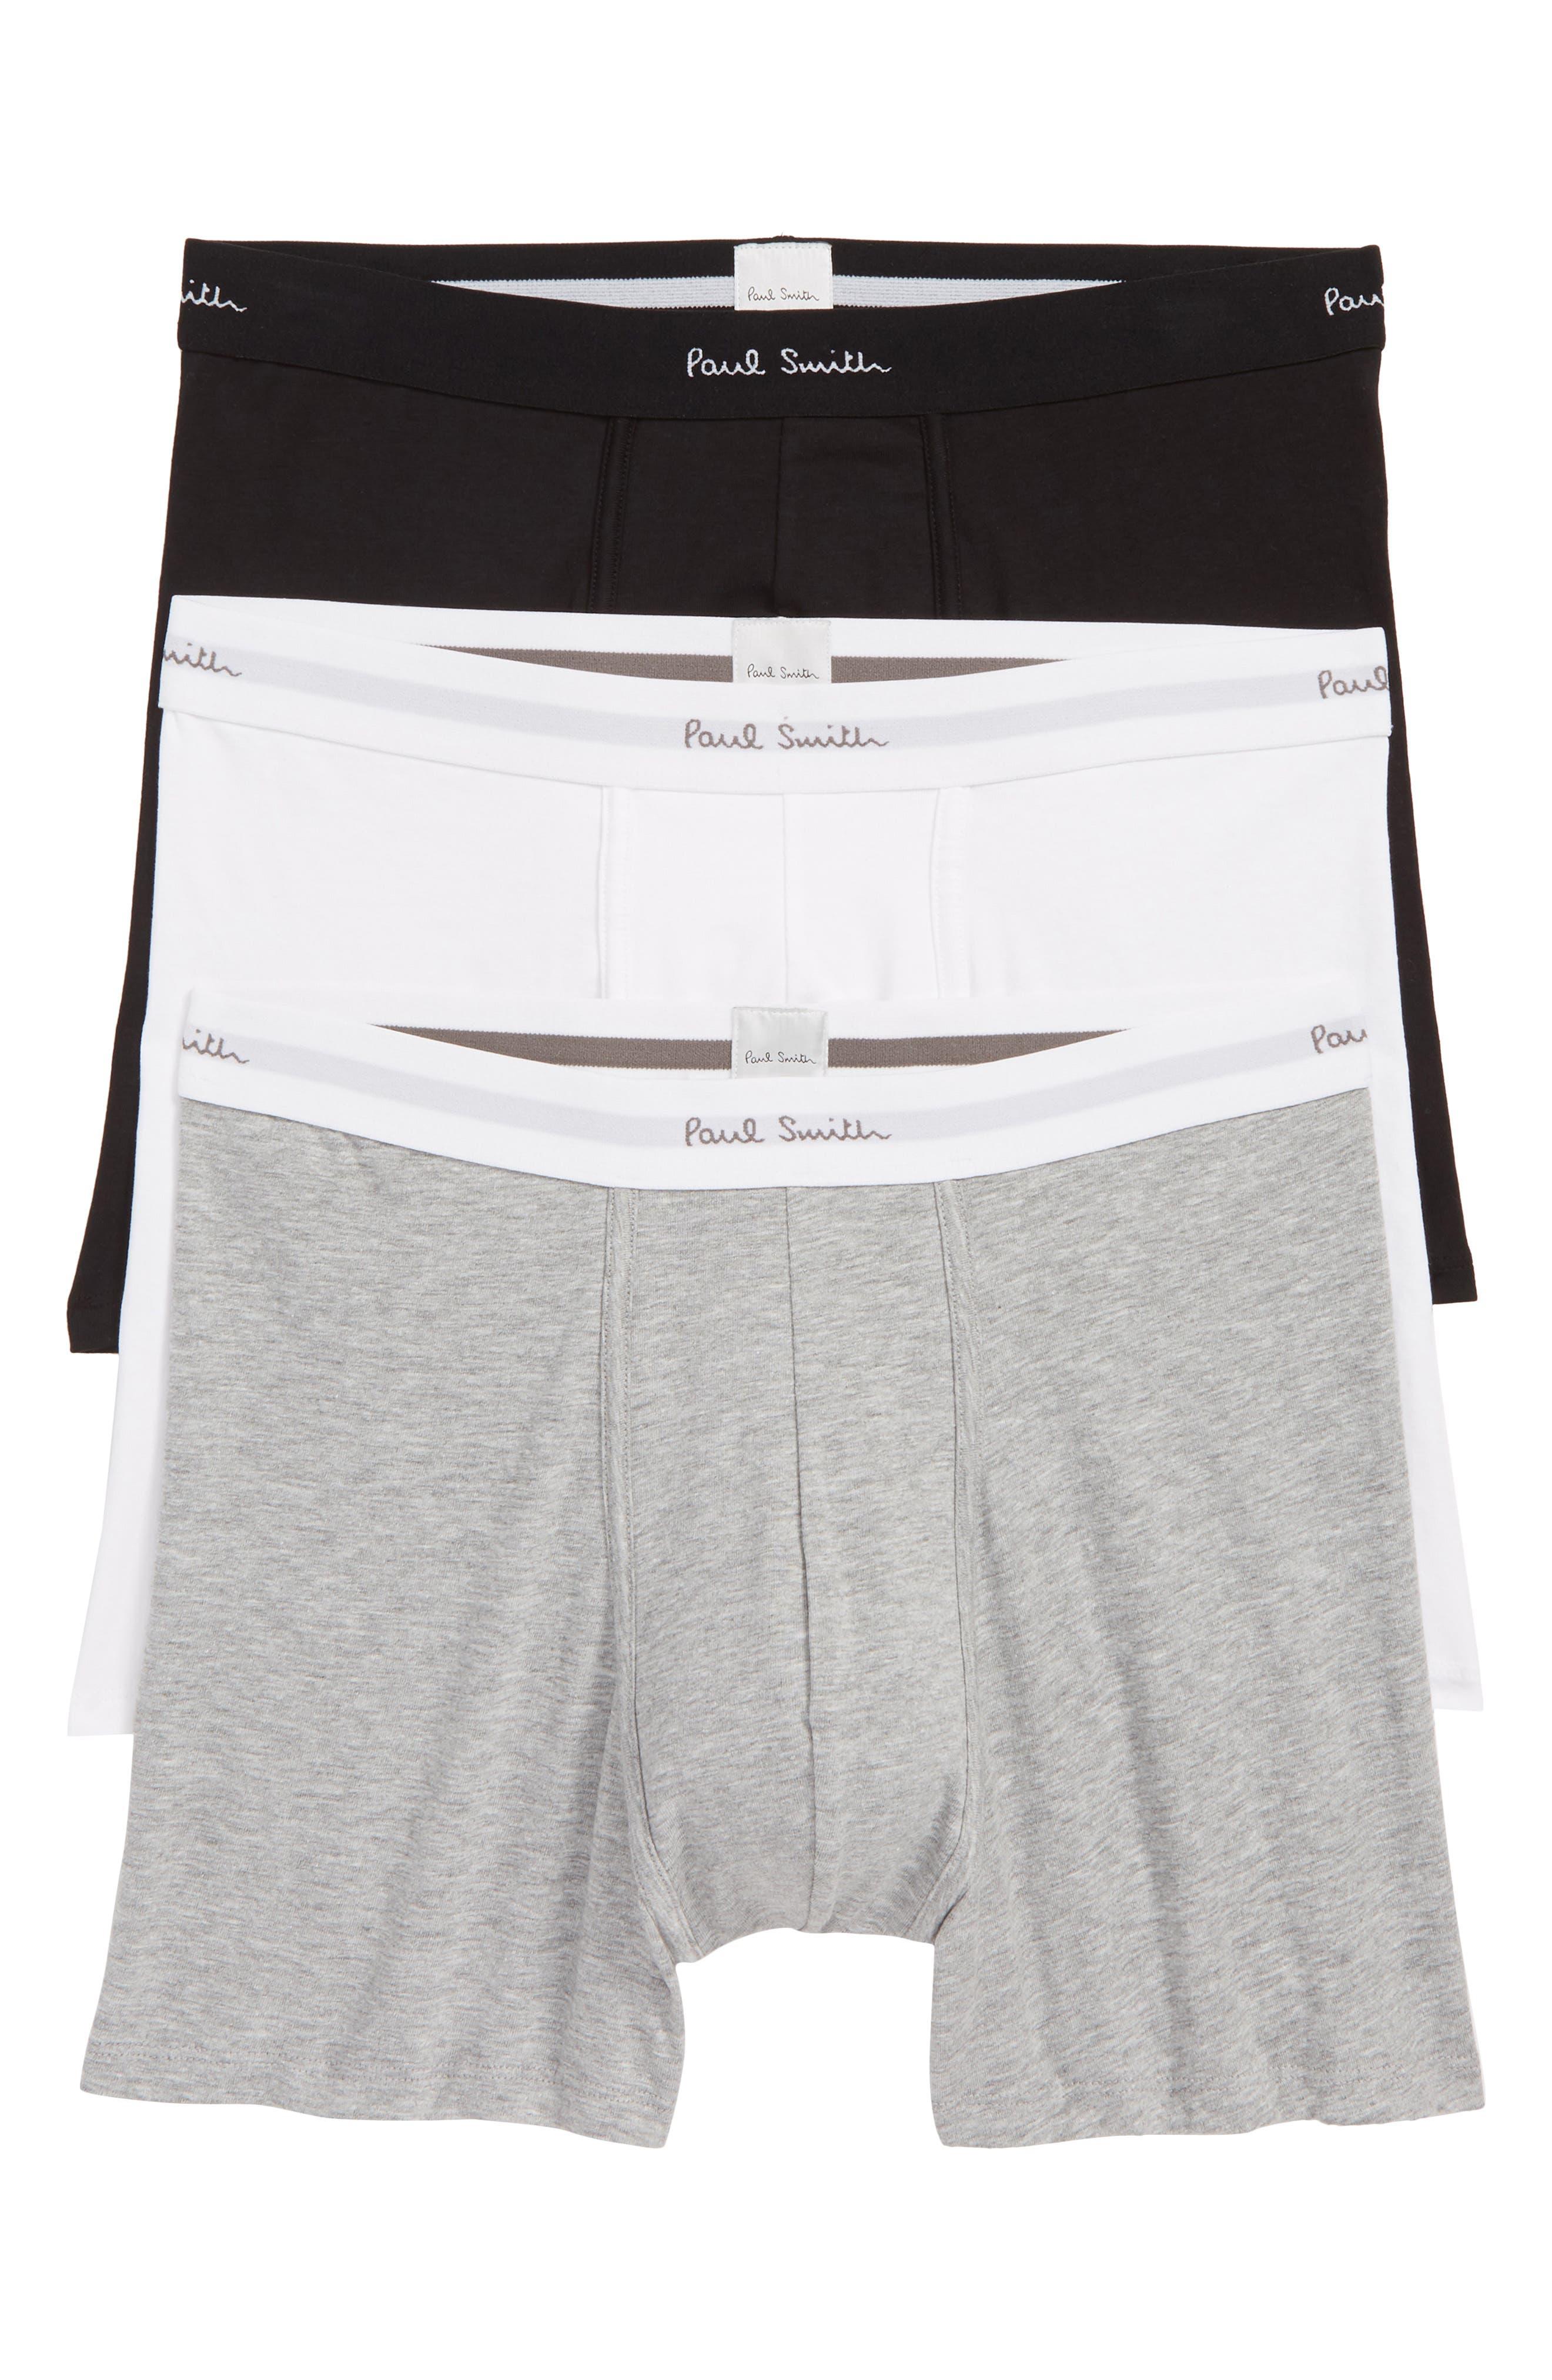 PAUL SMITH,                             3-Pack Trunks,                             Main thumbnail 1, color,                             BLACK/ WHITE/ GREY